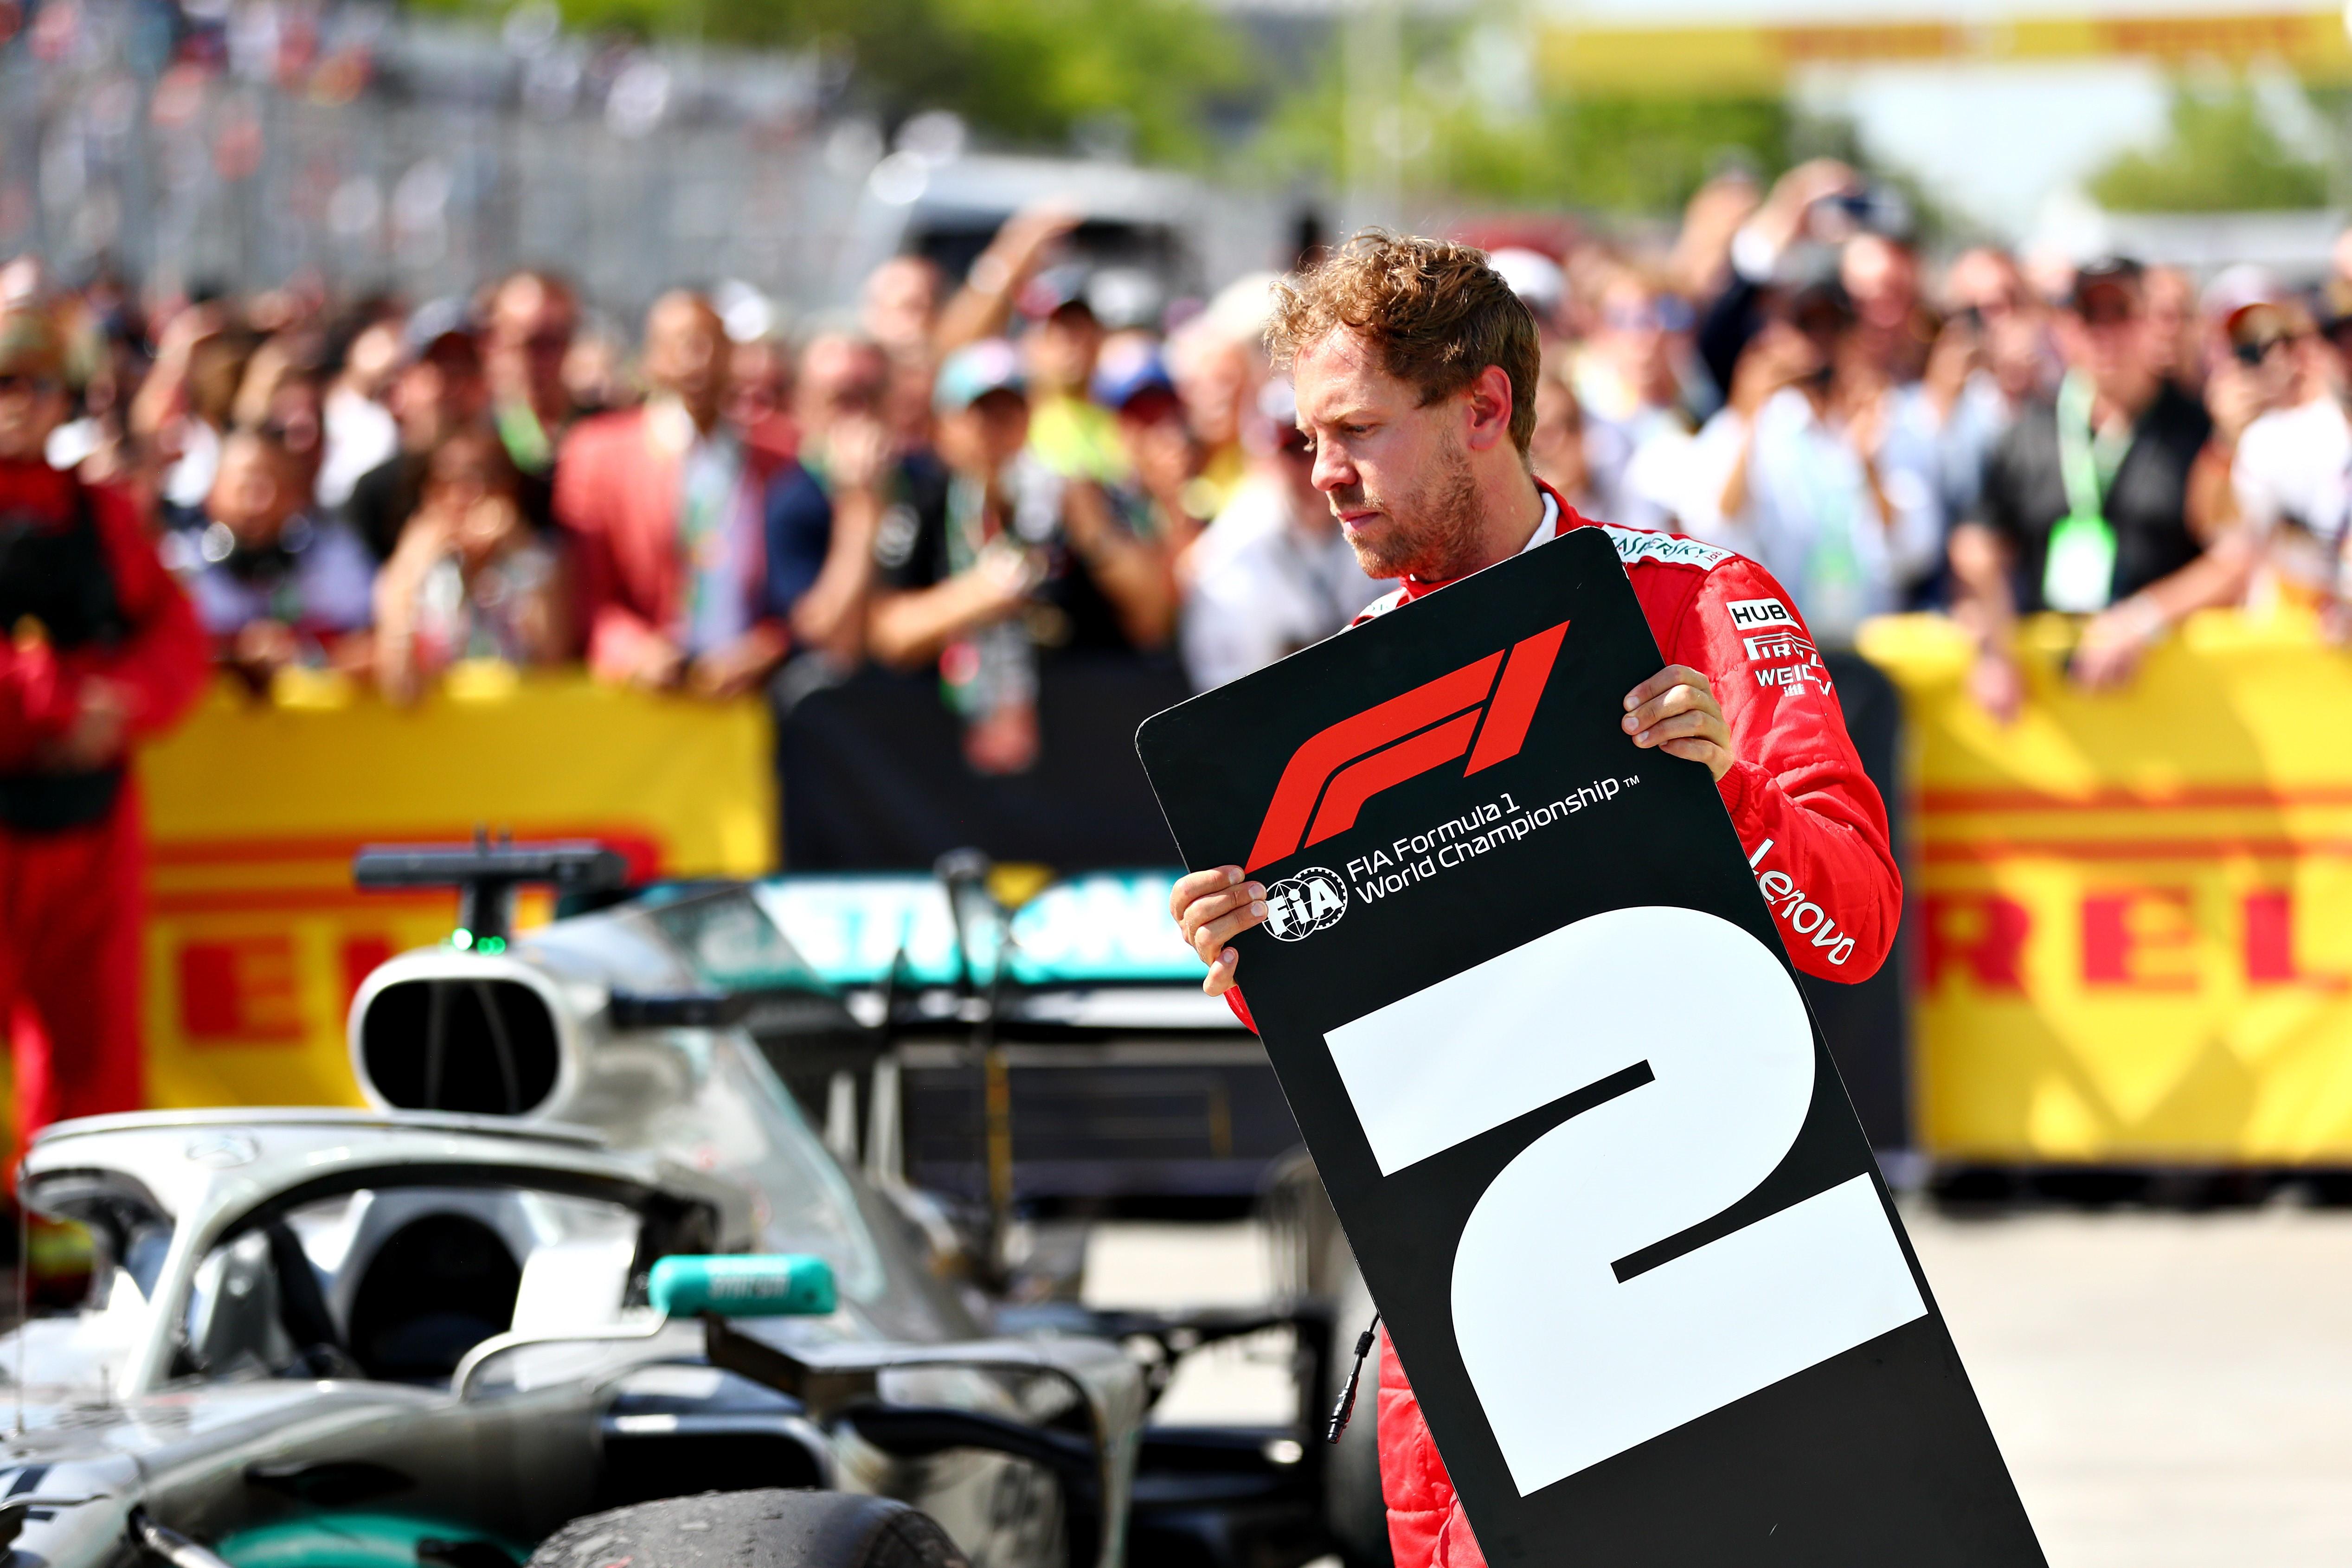 Sebastian Vettel (Ferrari) après l'arrivée du Grand Prix du Canada 2019